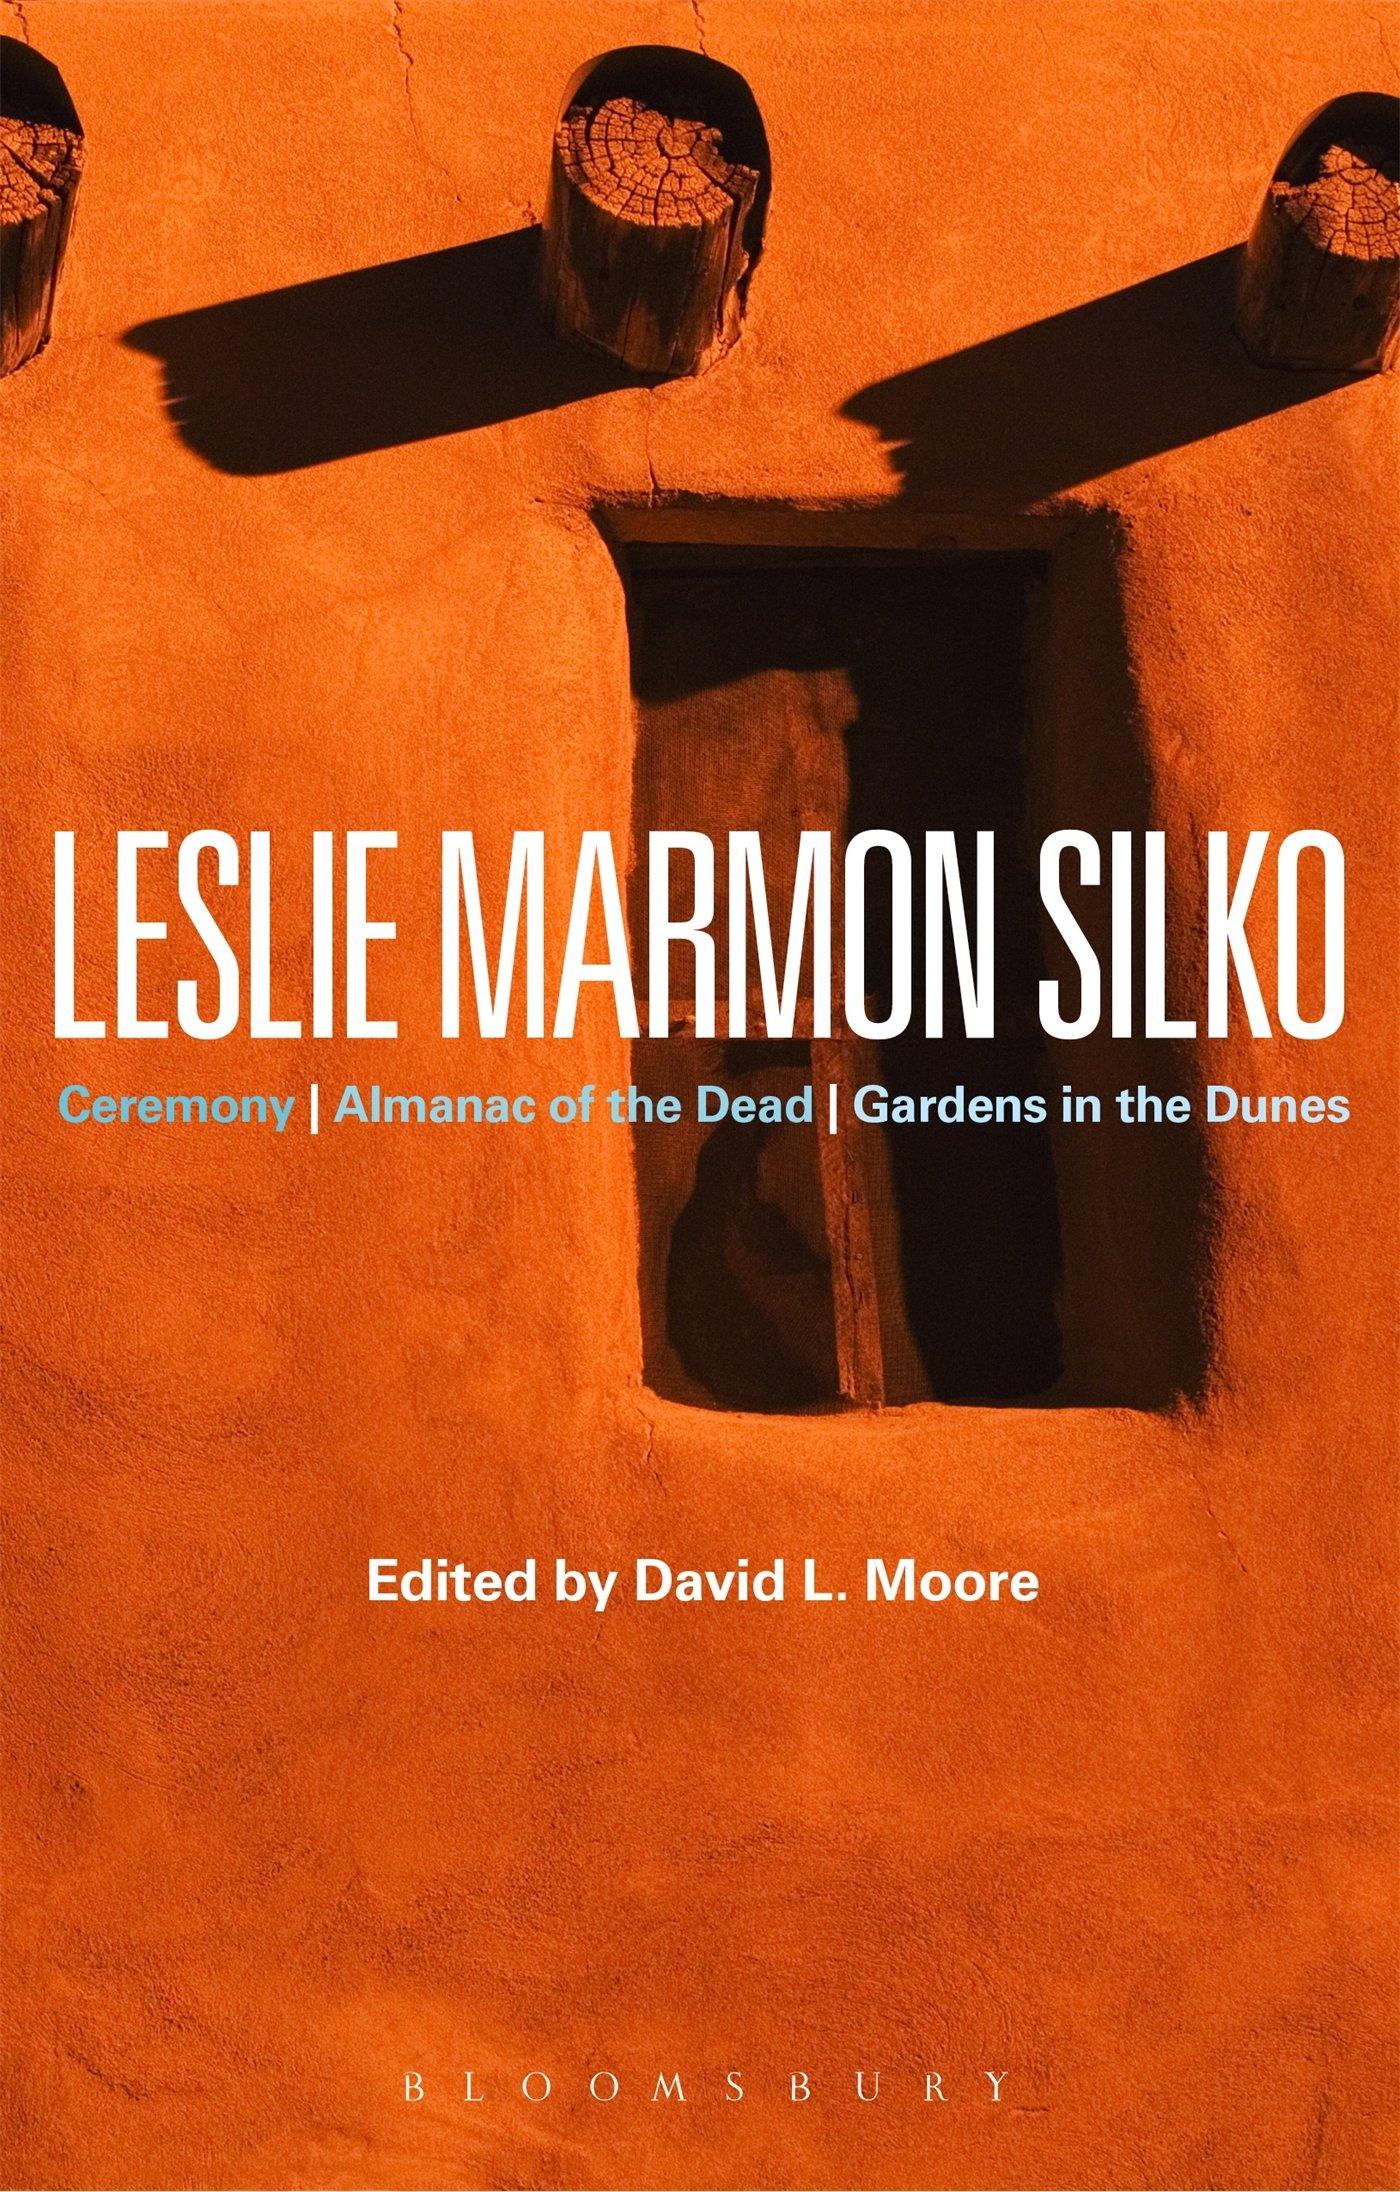 Leslie Marmon Silko  Ceremony Almanac Of The Dead Gardens In The Dunes  Bloomsbury Studies In Contemporary North American Fiction